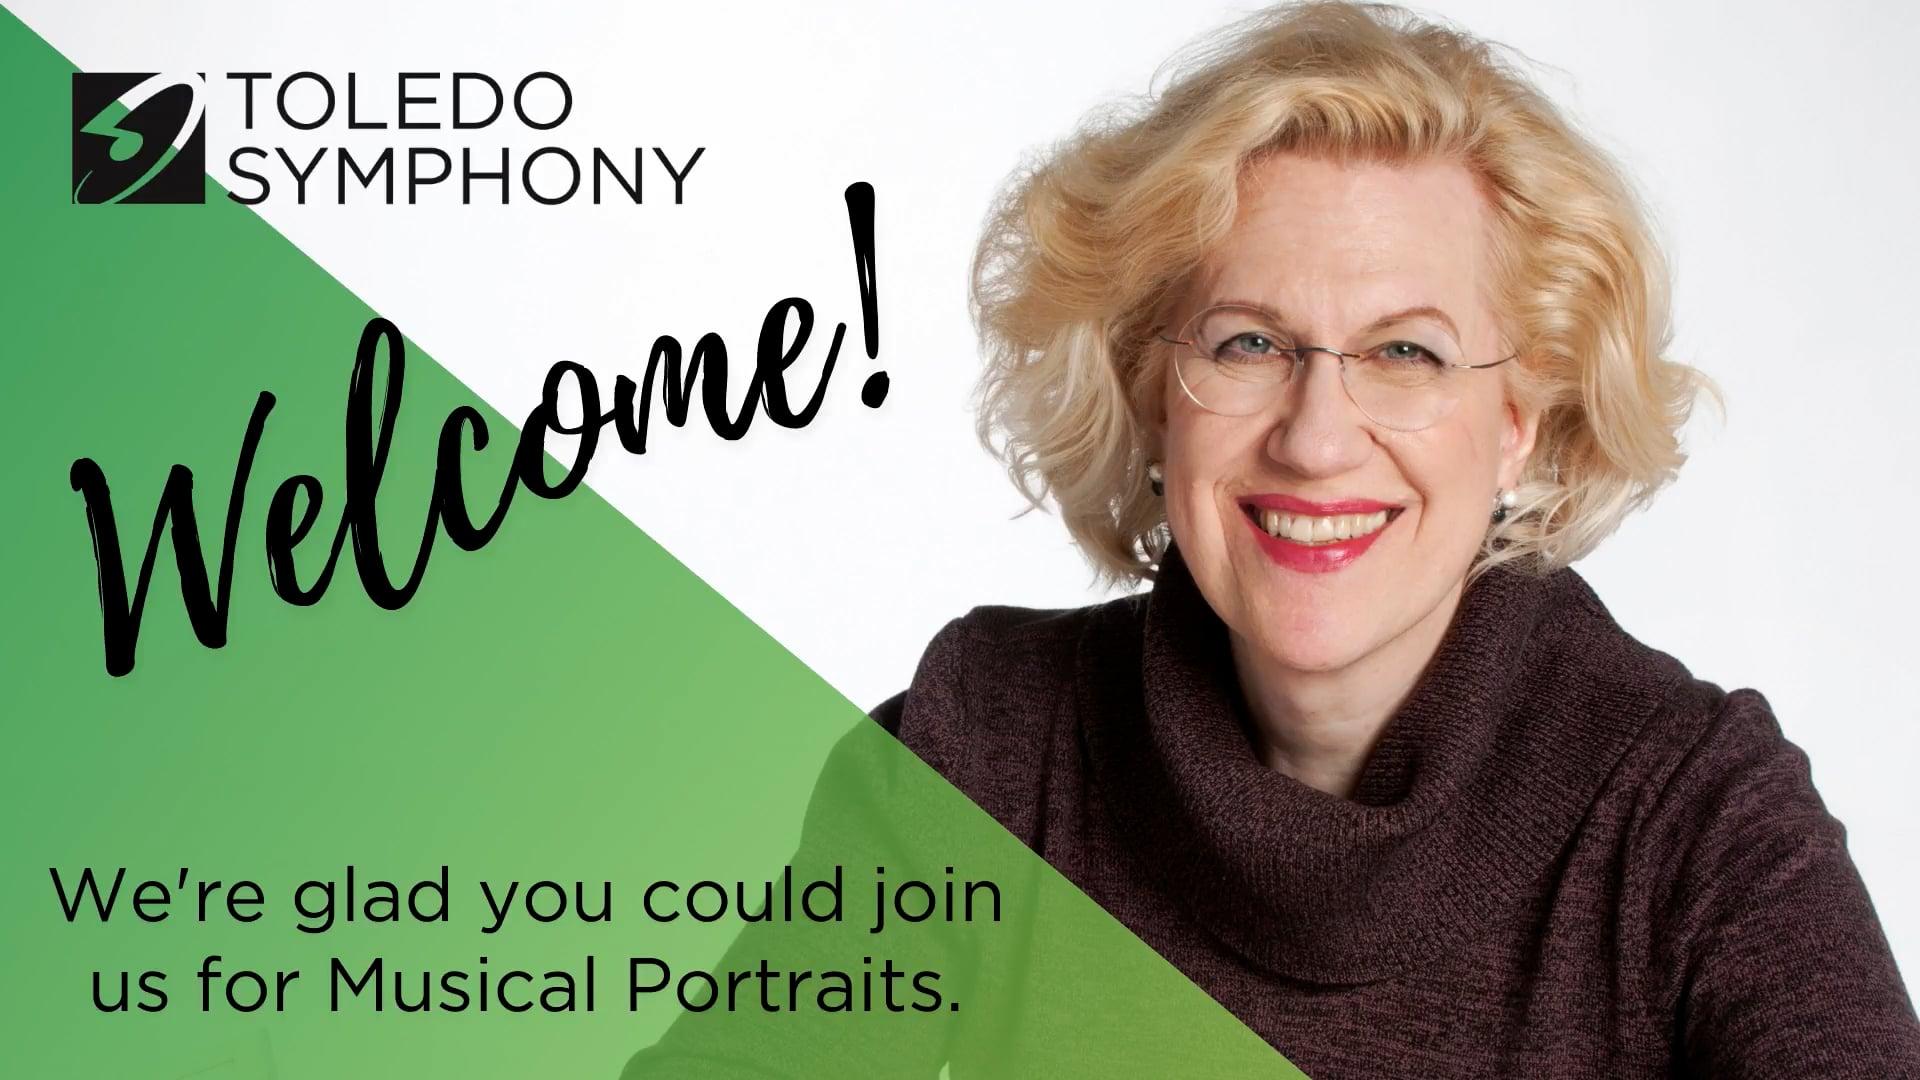 Musical Portraits Pre-Concert Talk